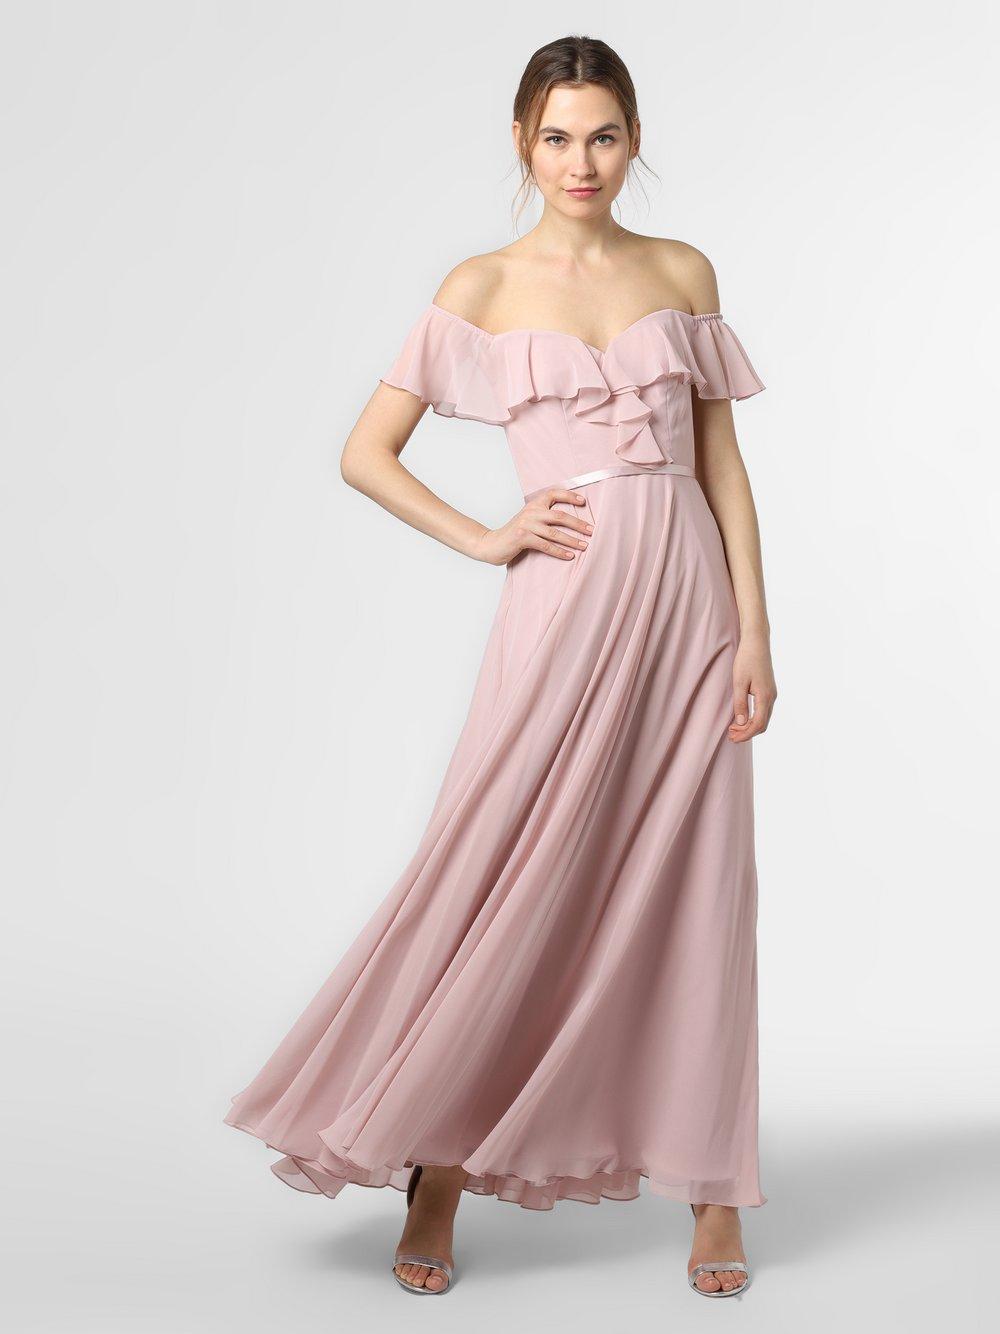 Laona – Damska sukienka wieczorowa, różowy Van Graaf 472449-0001-00380